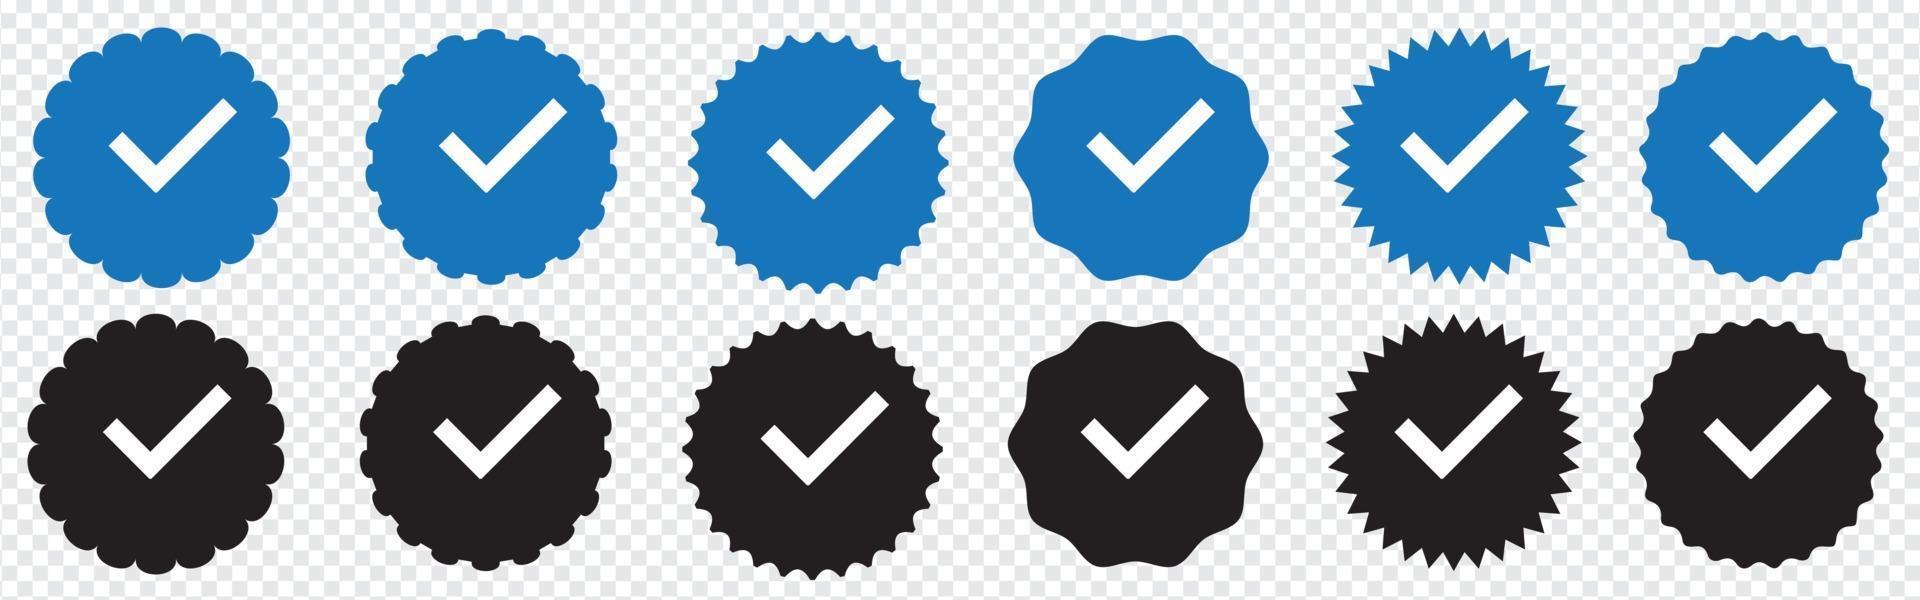 Verified badge profile set. Instagram verified badge. Social media vector